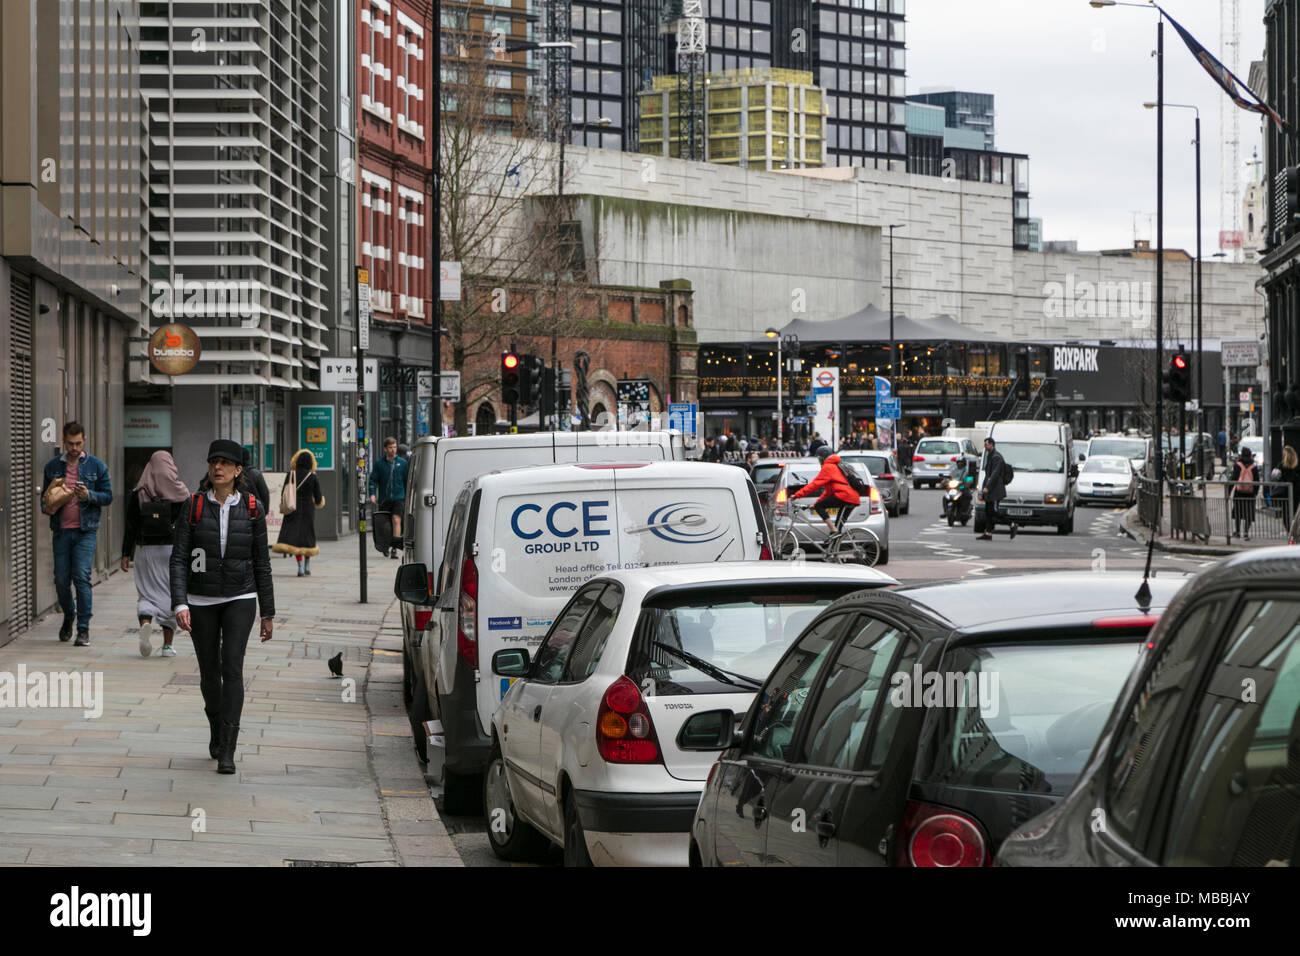 Richmix, Bethnal Green Road, Shoreditch, London - Stock Image